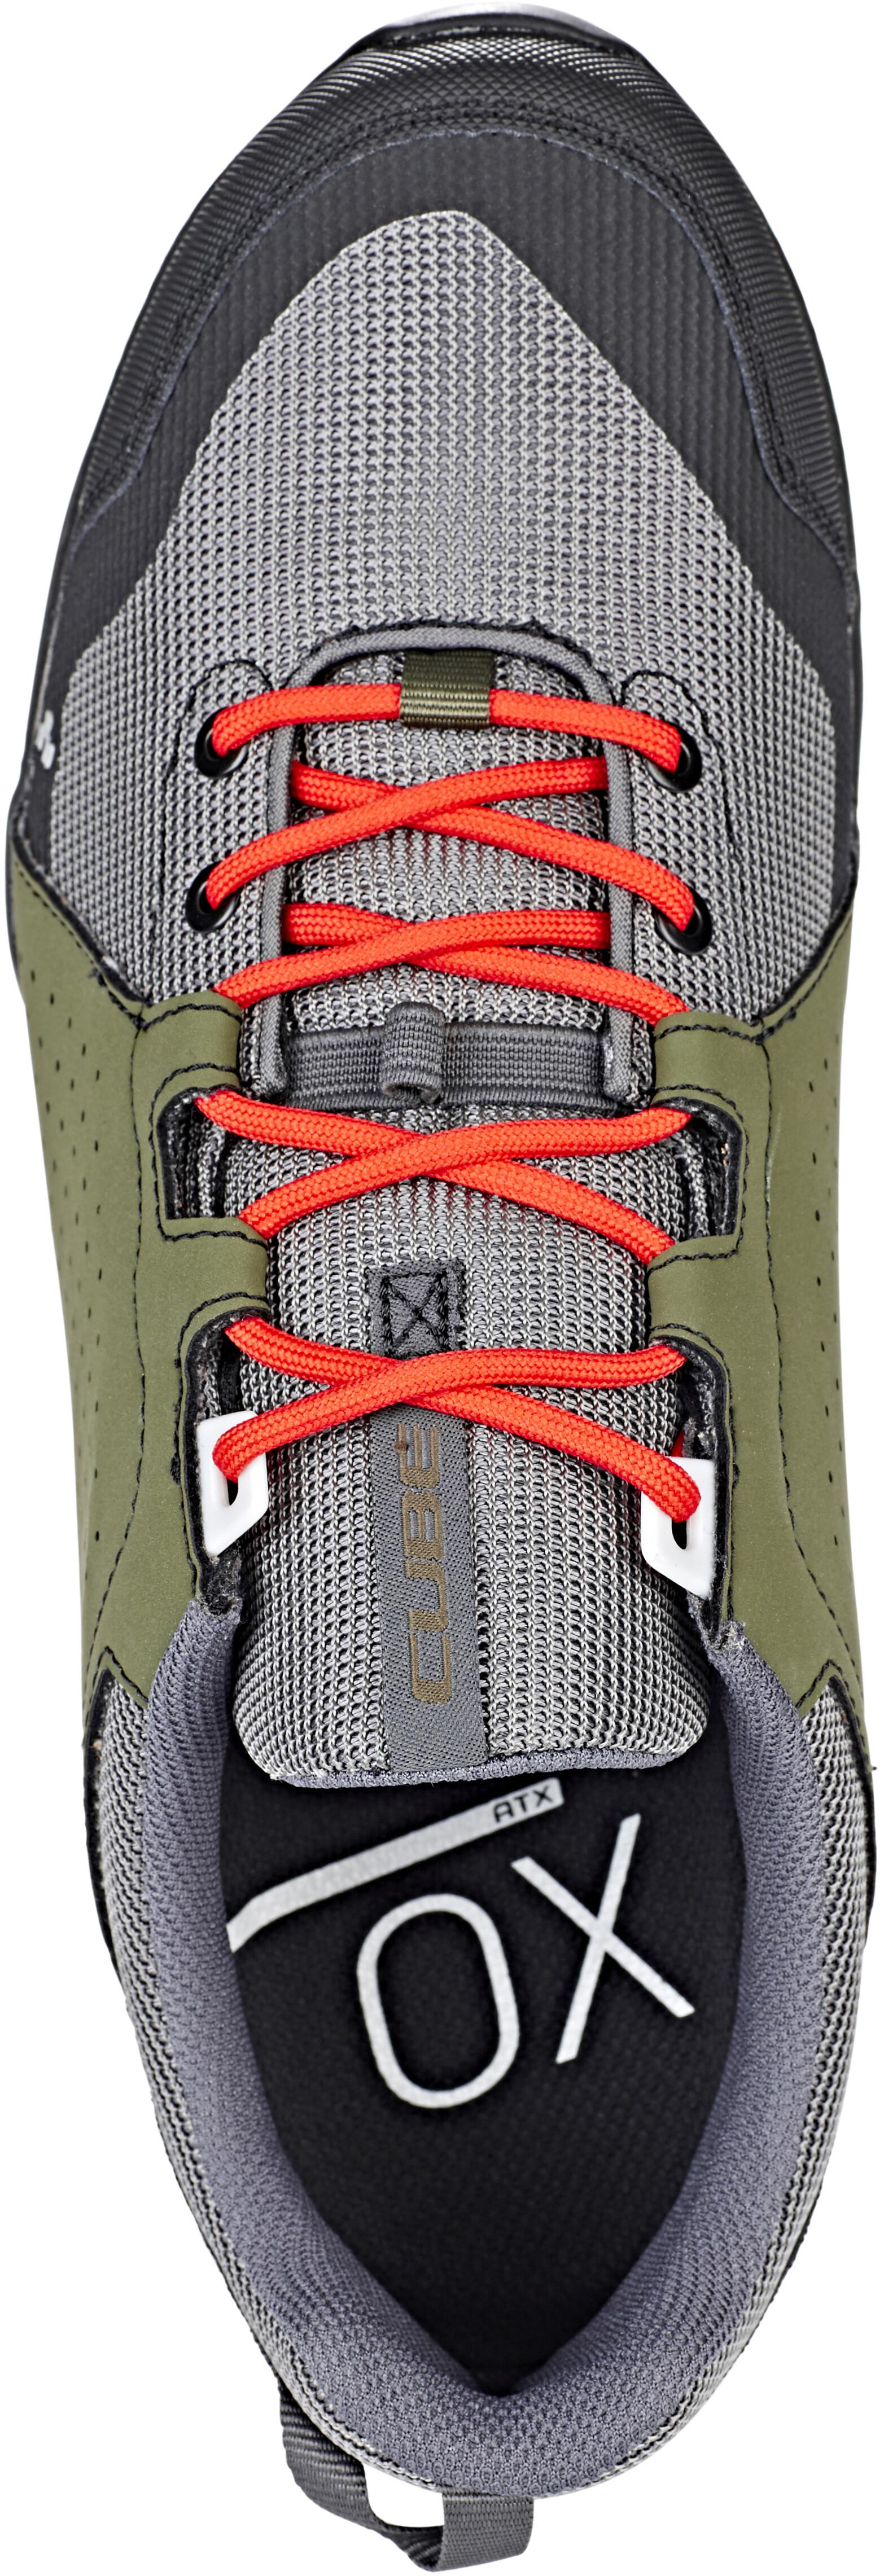 81ed555c16d2b Cube ATX OX Shoes grey/olive